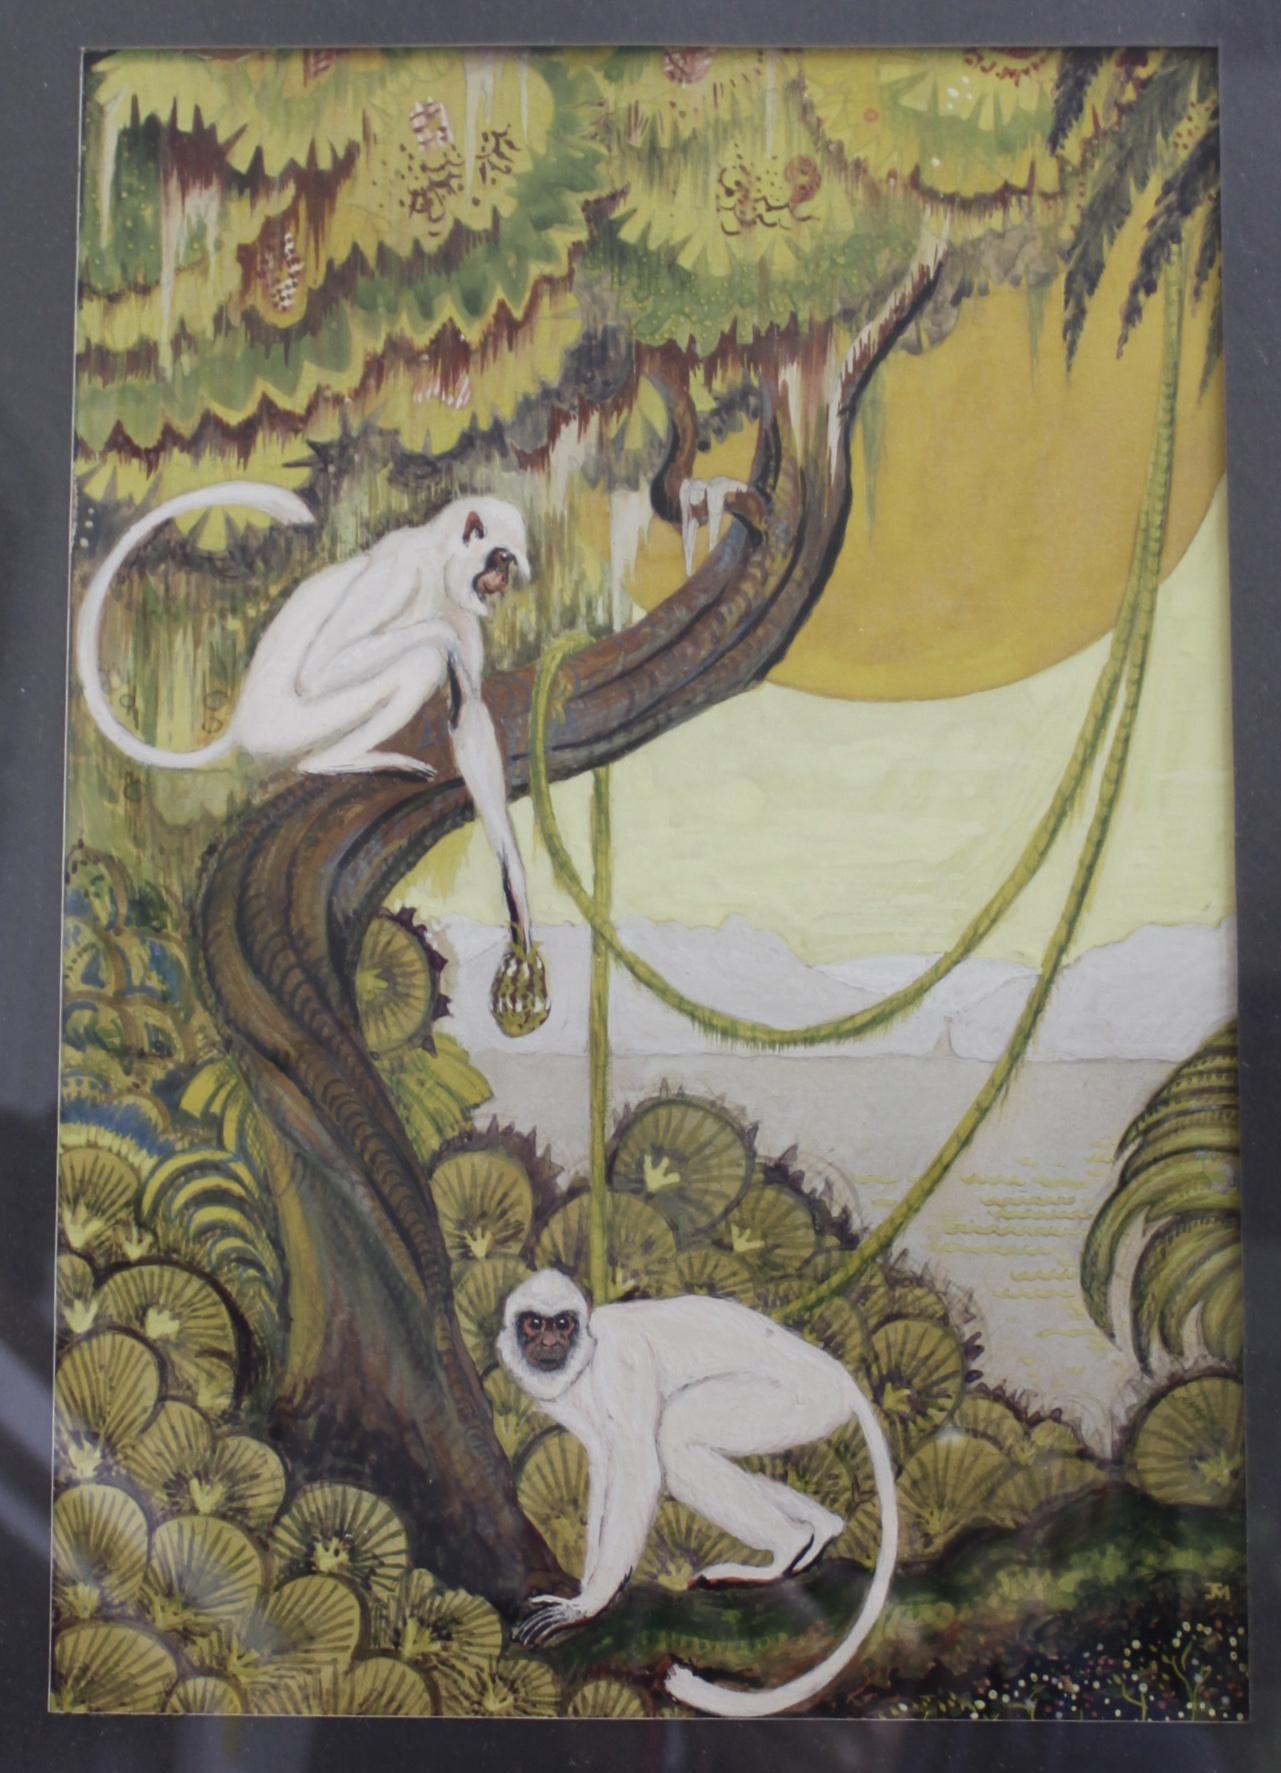 Art deco paintings 1920 - 4ed49